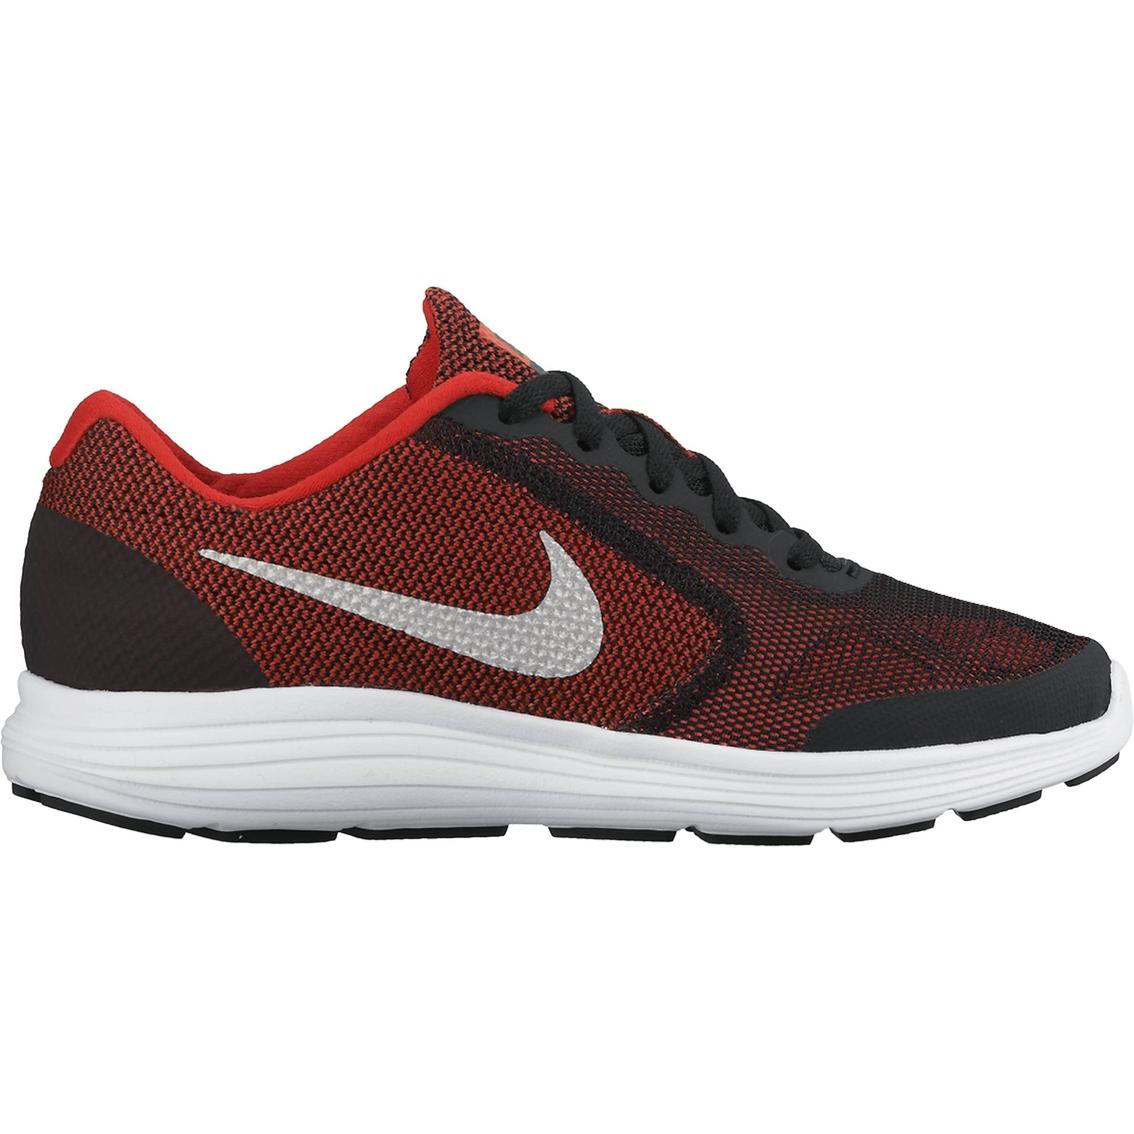 46de9dfb7ce Nike Boys Revolution 3 Running Shoes